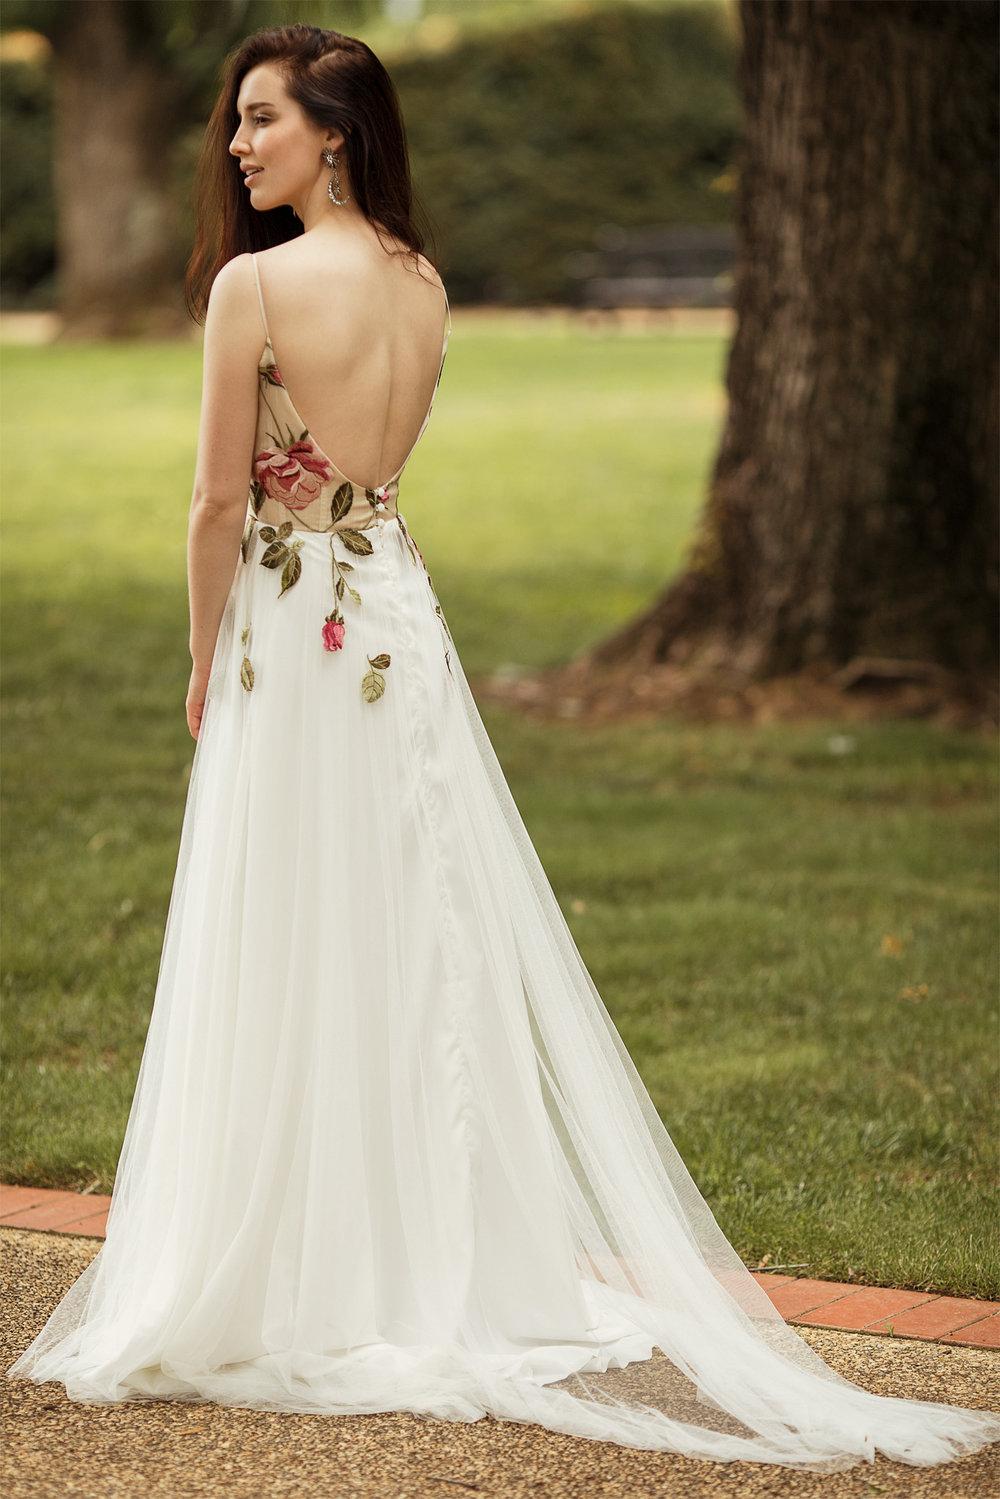 SYDNEY BRIDAL WEAR DESIGNER AUSTRALIA